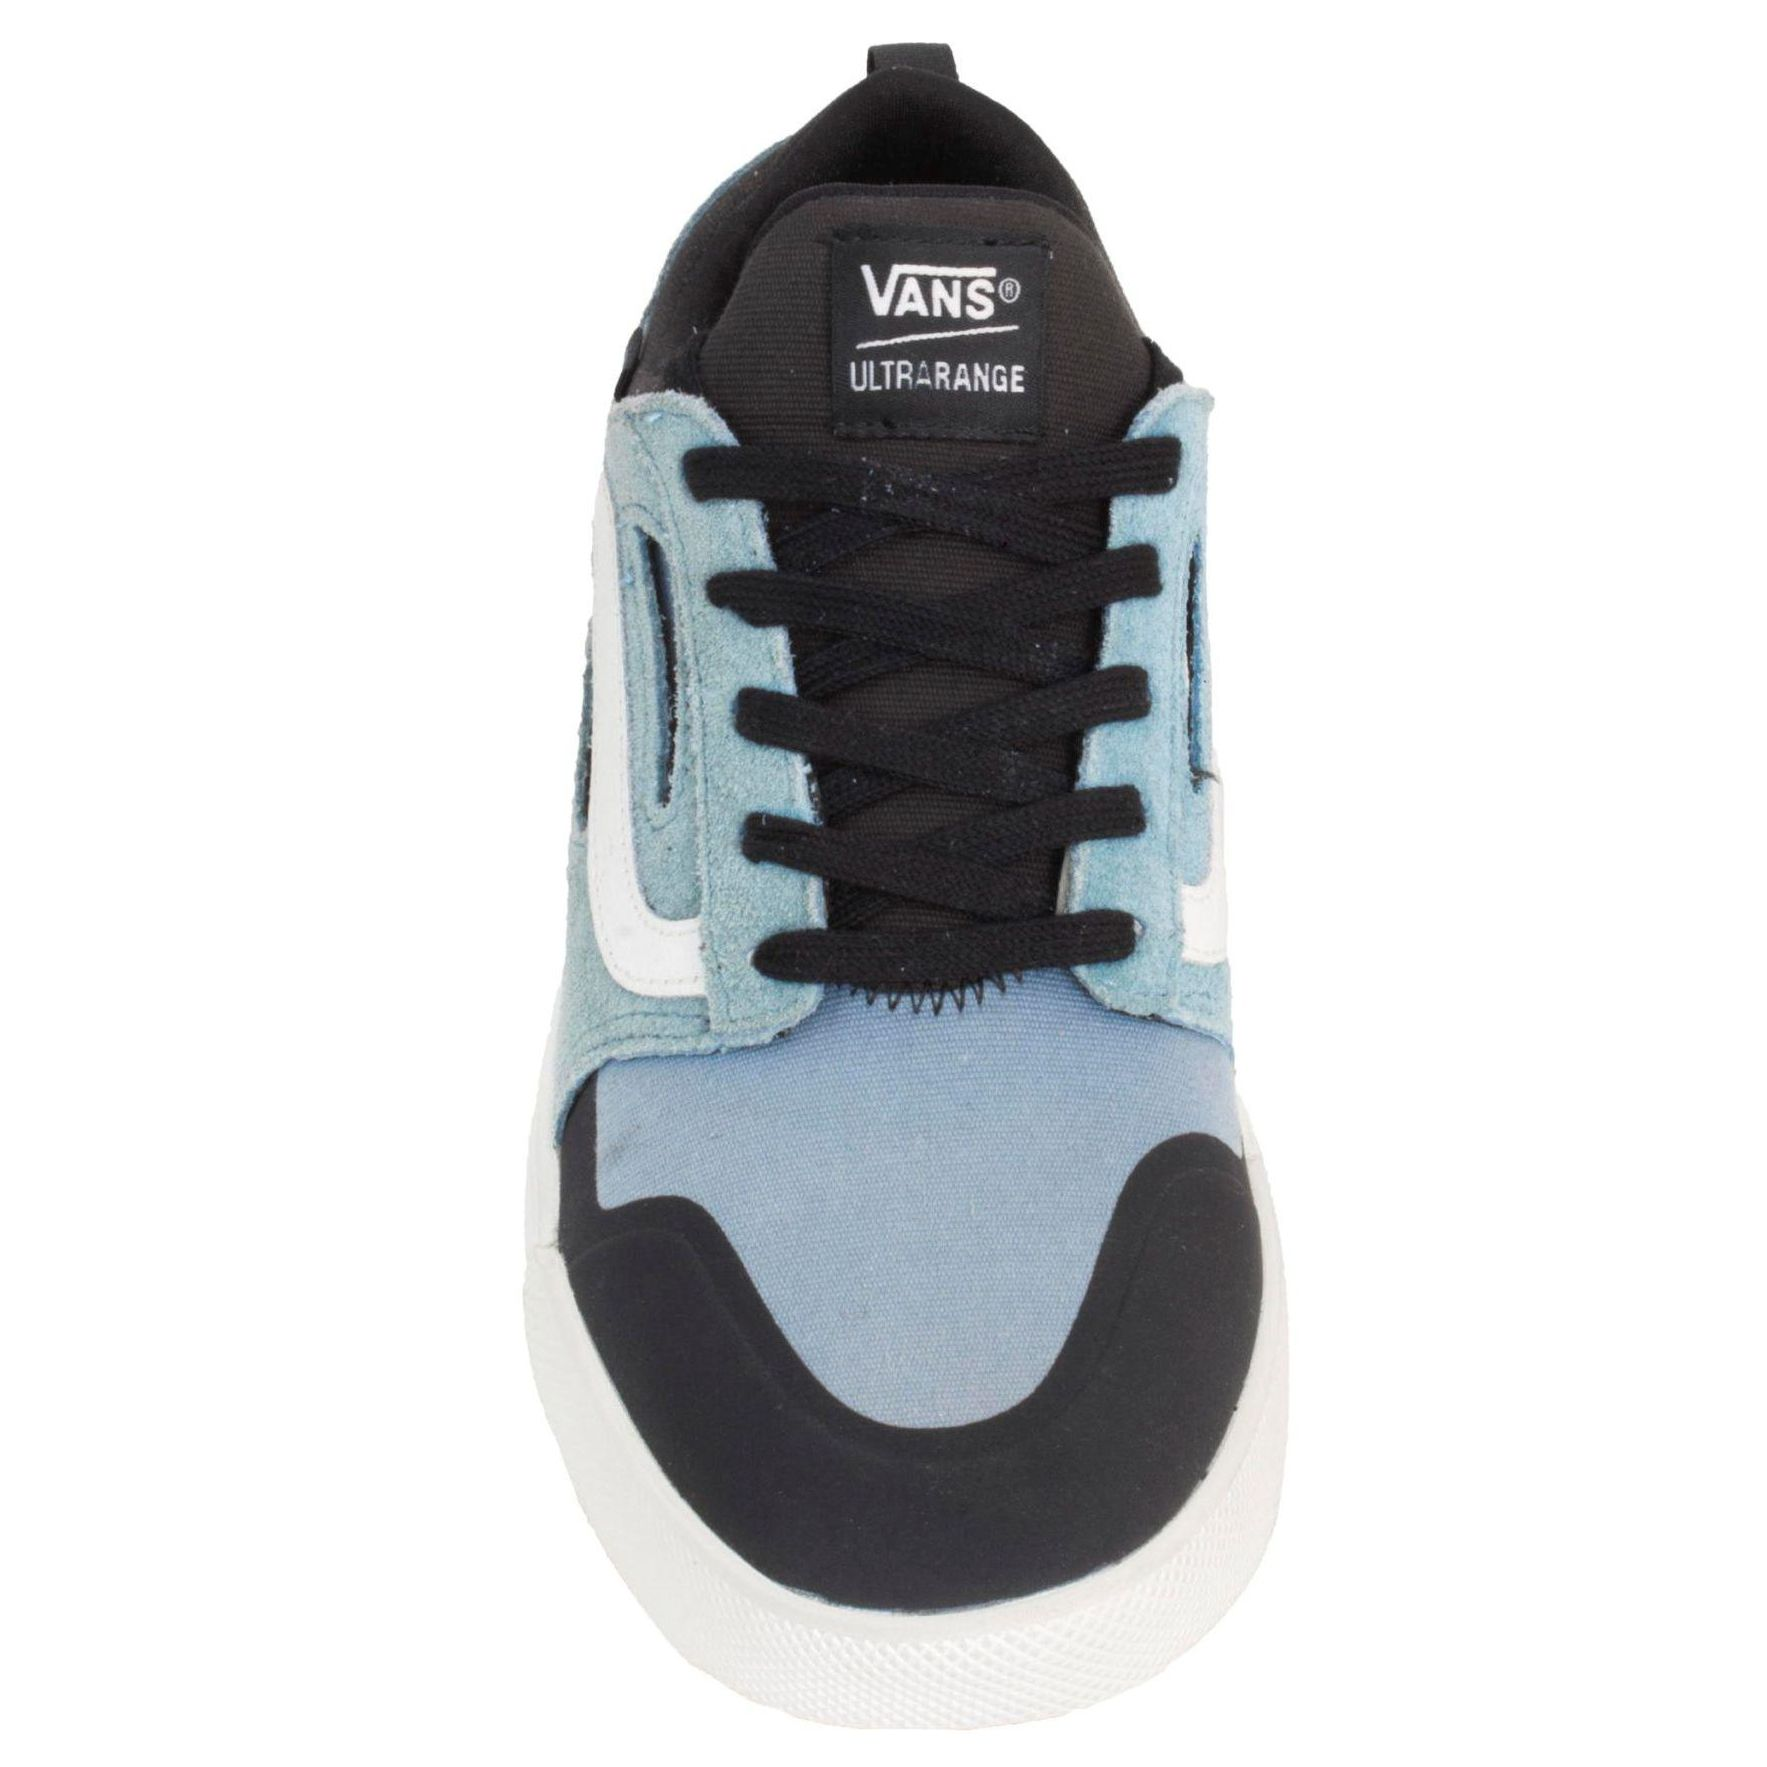 Tênis Vans Ultrarange 3D Preto-Azul